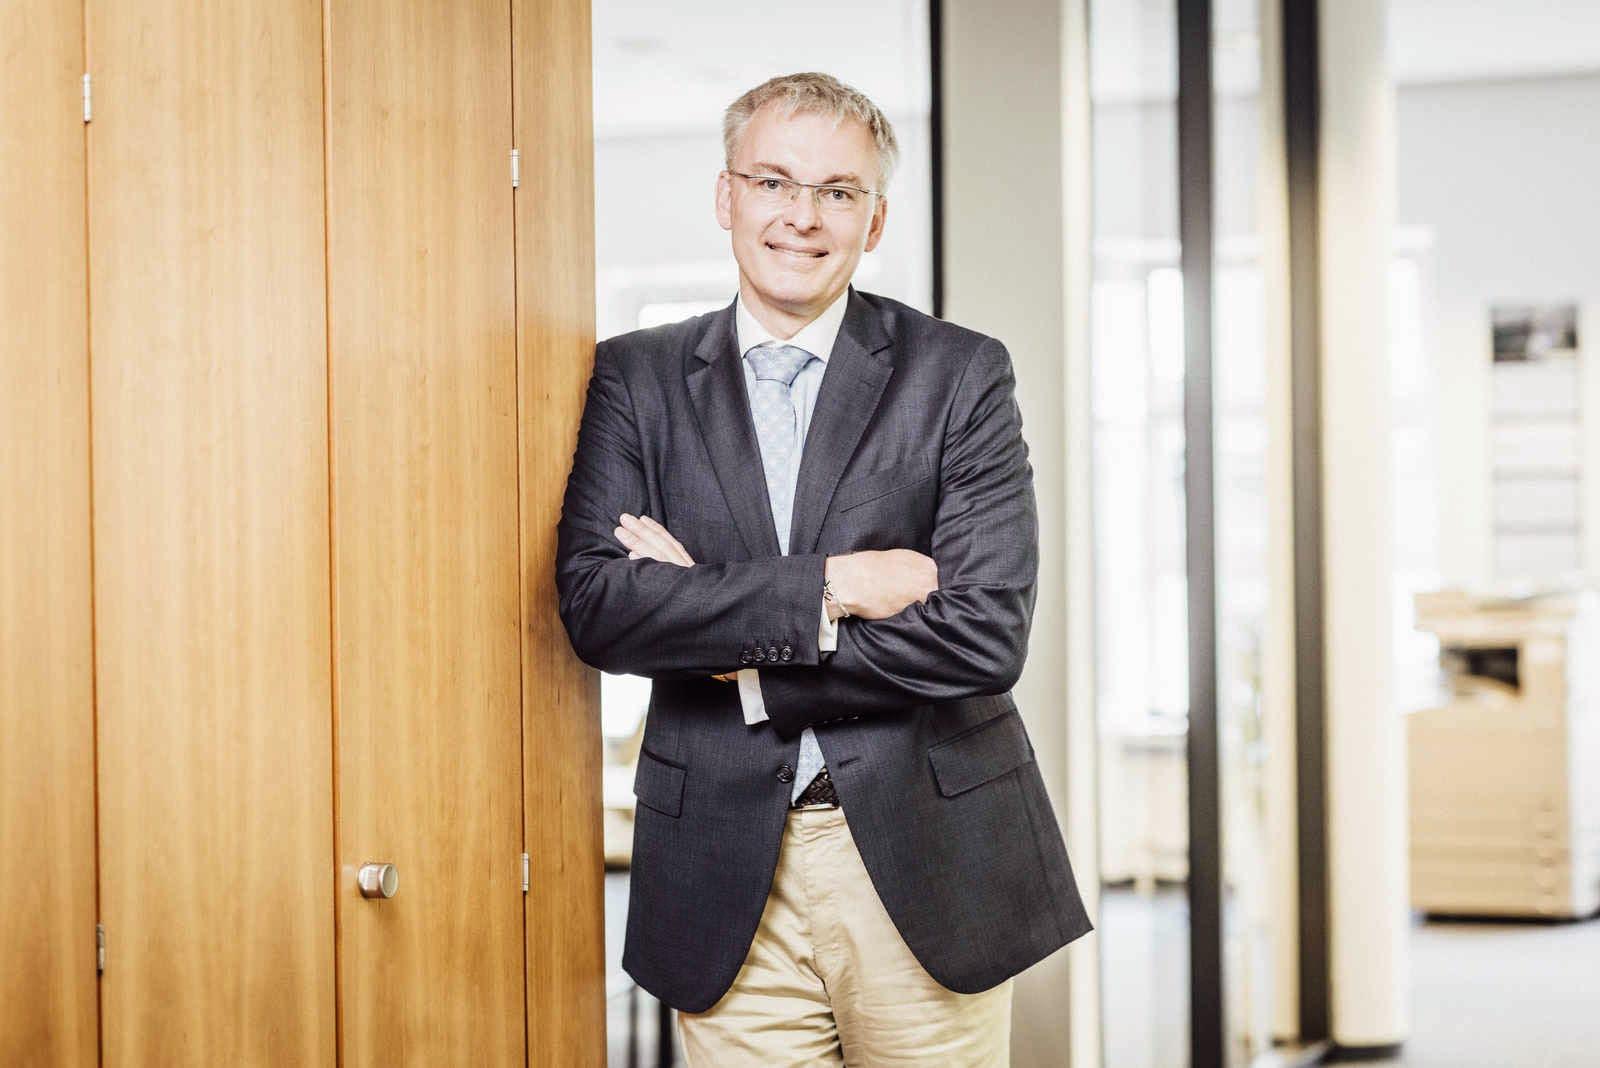 businessfotograf hamburg scandlines-morten haure-petersen businessfotos businessportrait editorial